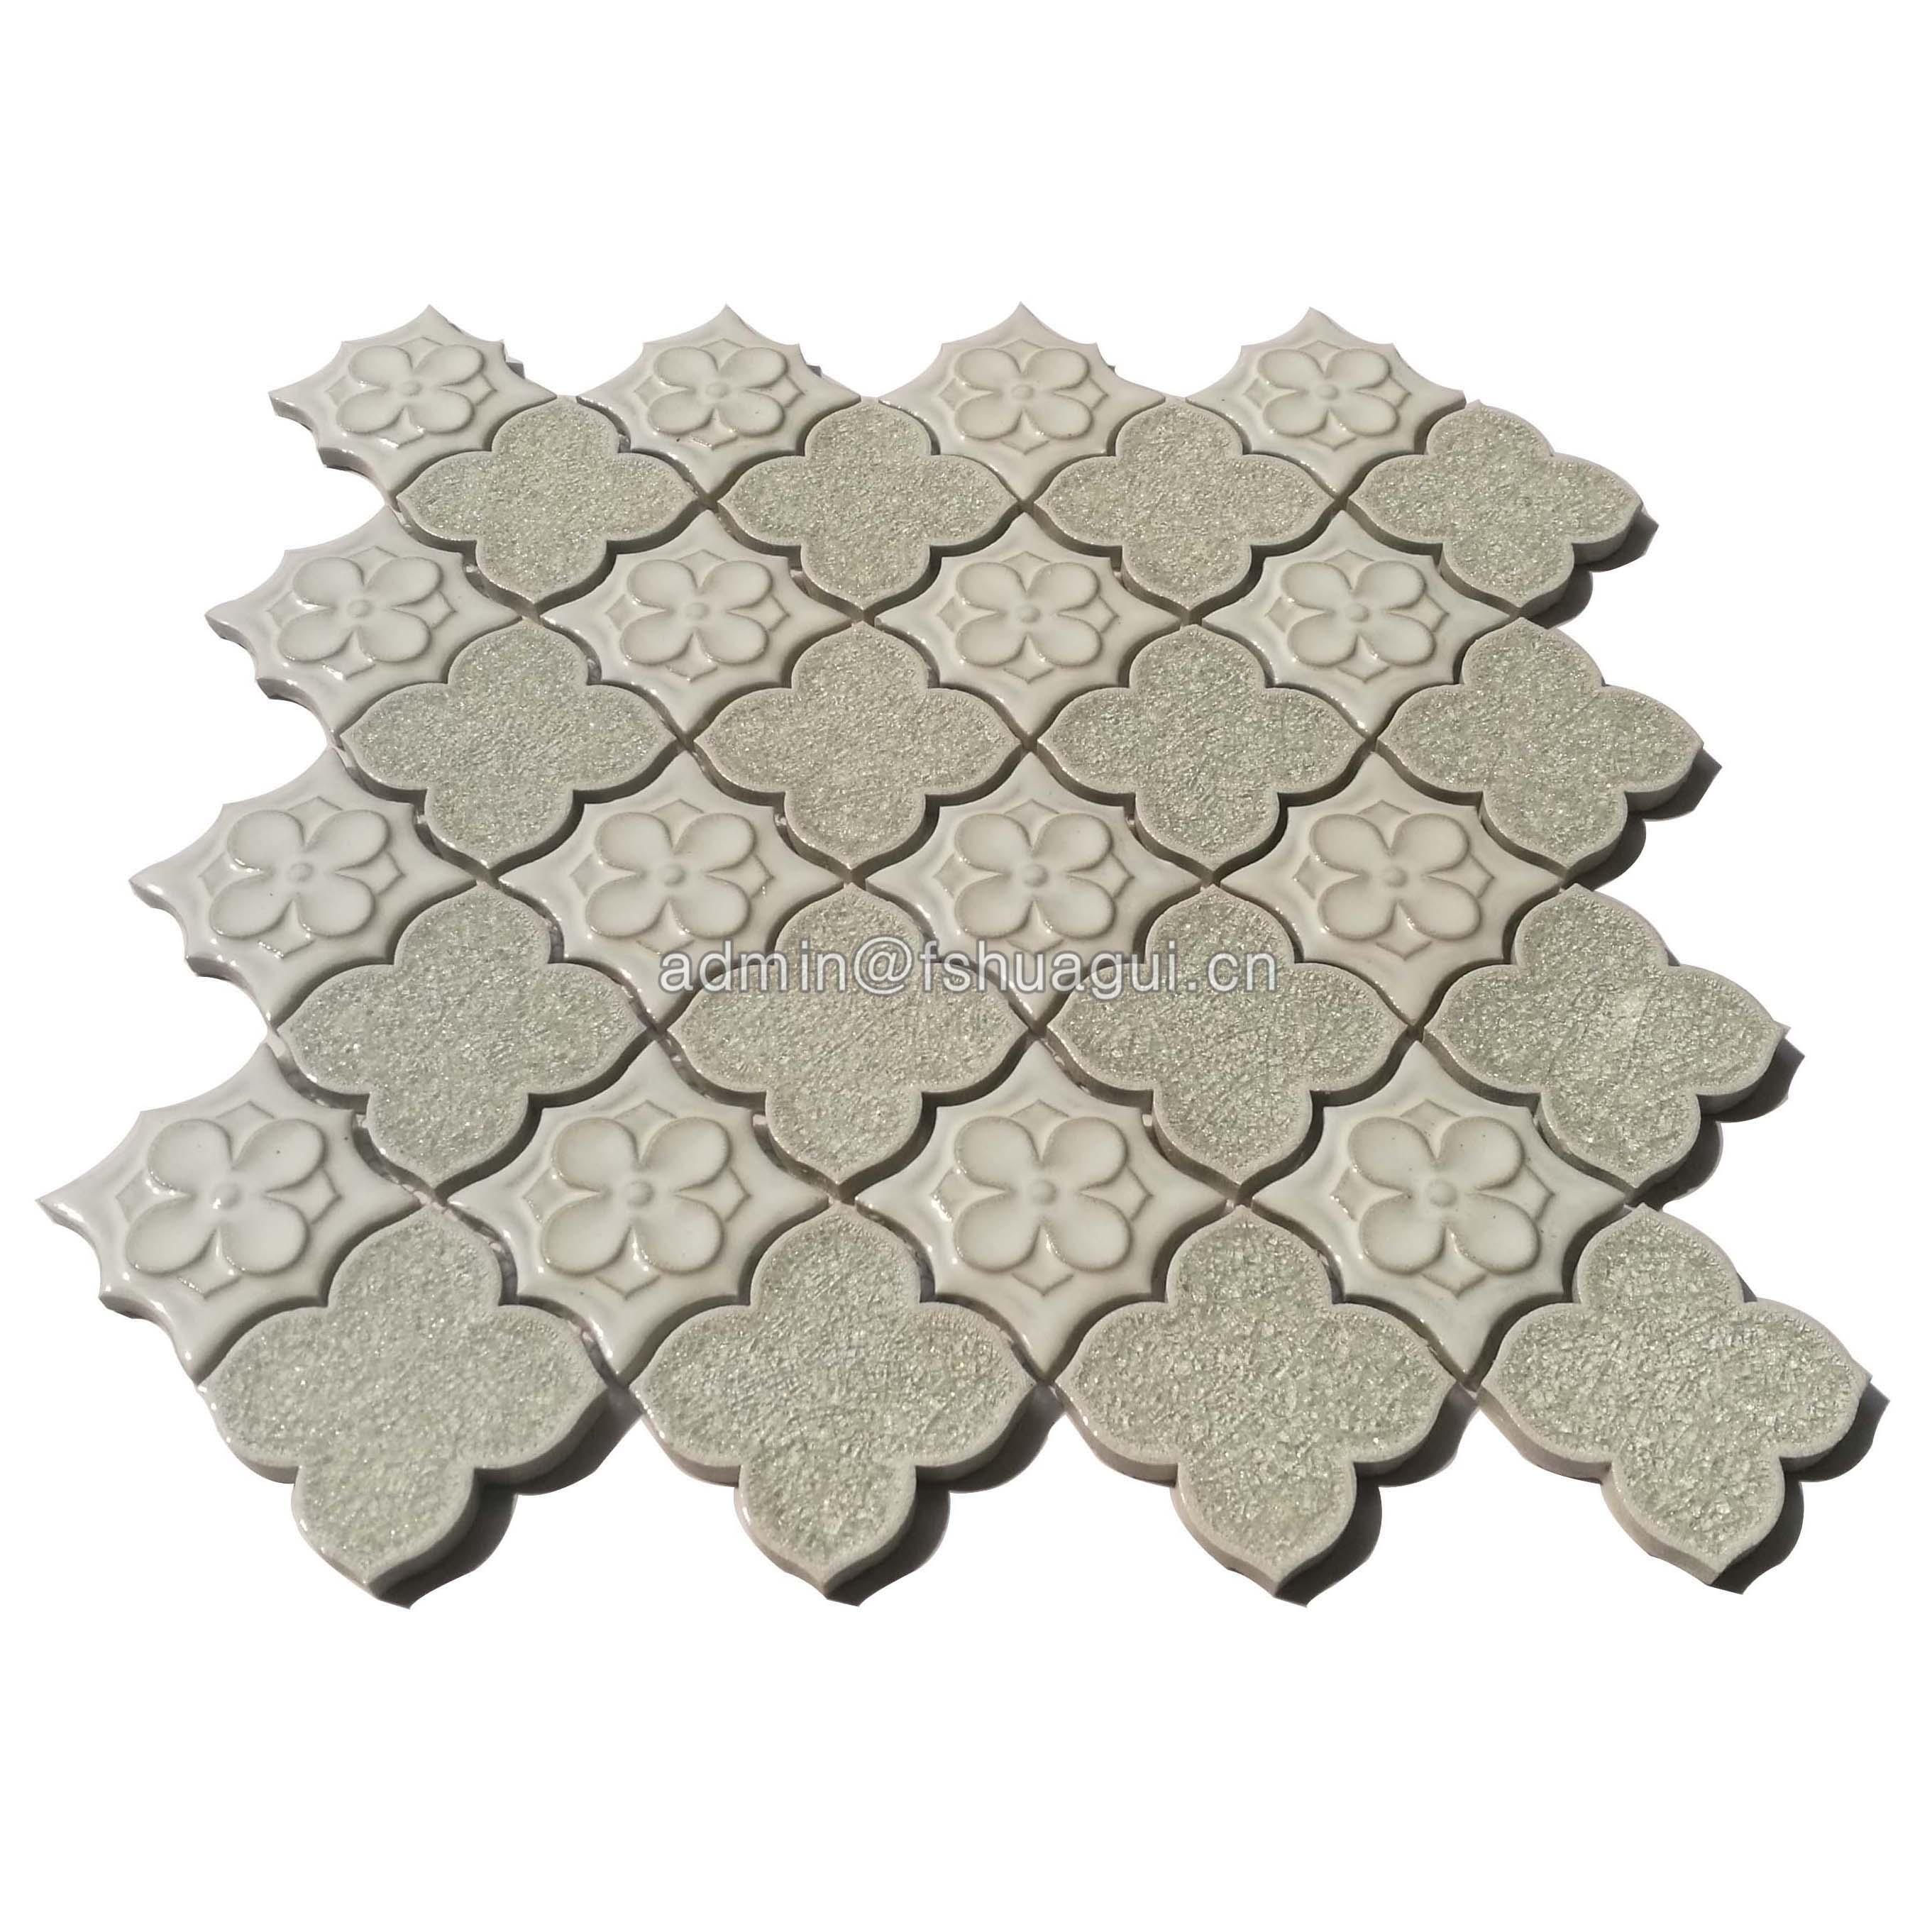 Huagui Ceramic Mosaic Tile HG-IC013 CERAMIC MOSAIC TILE image2